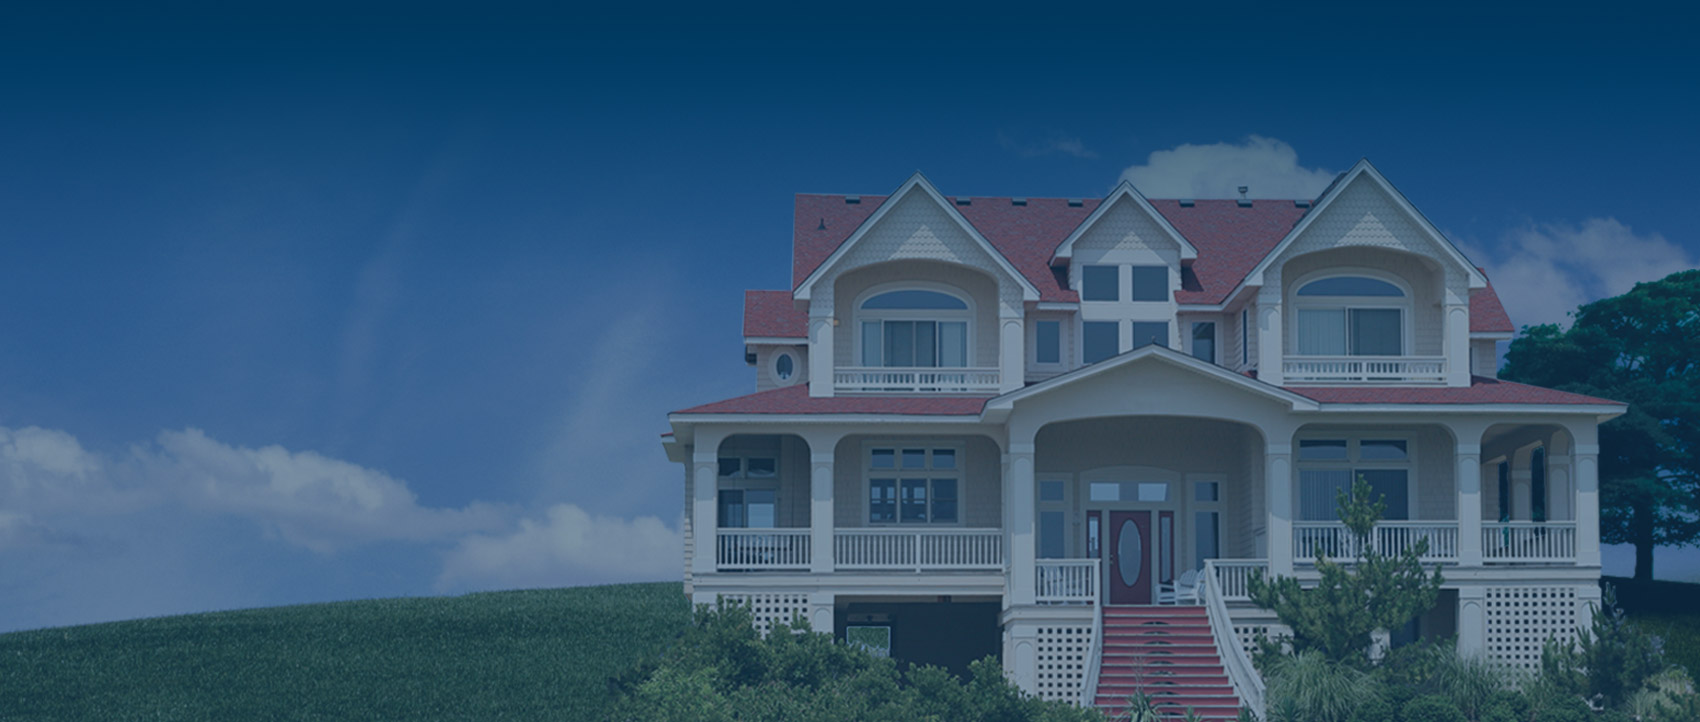 Home Inspection Checklist in Plano